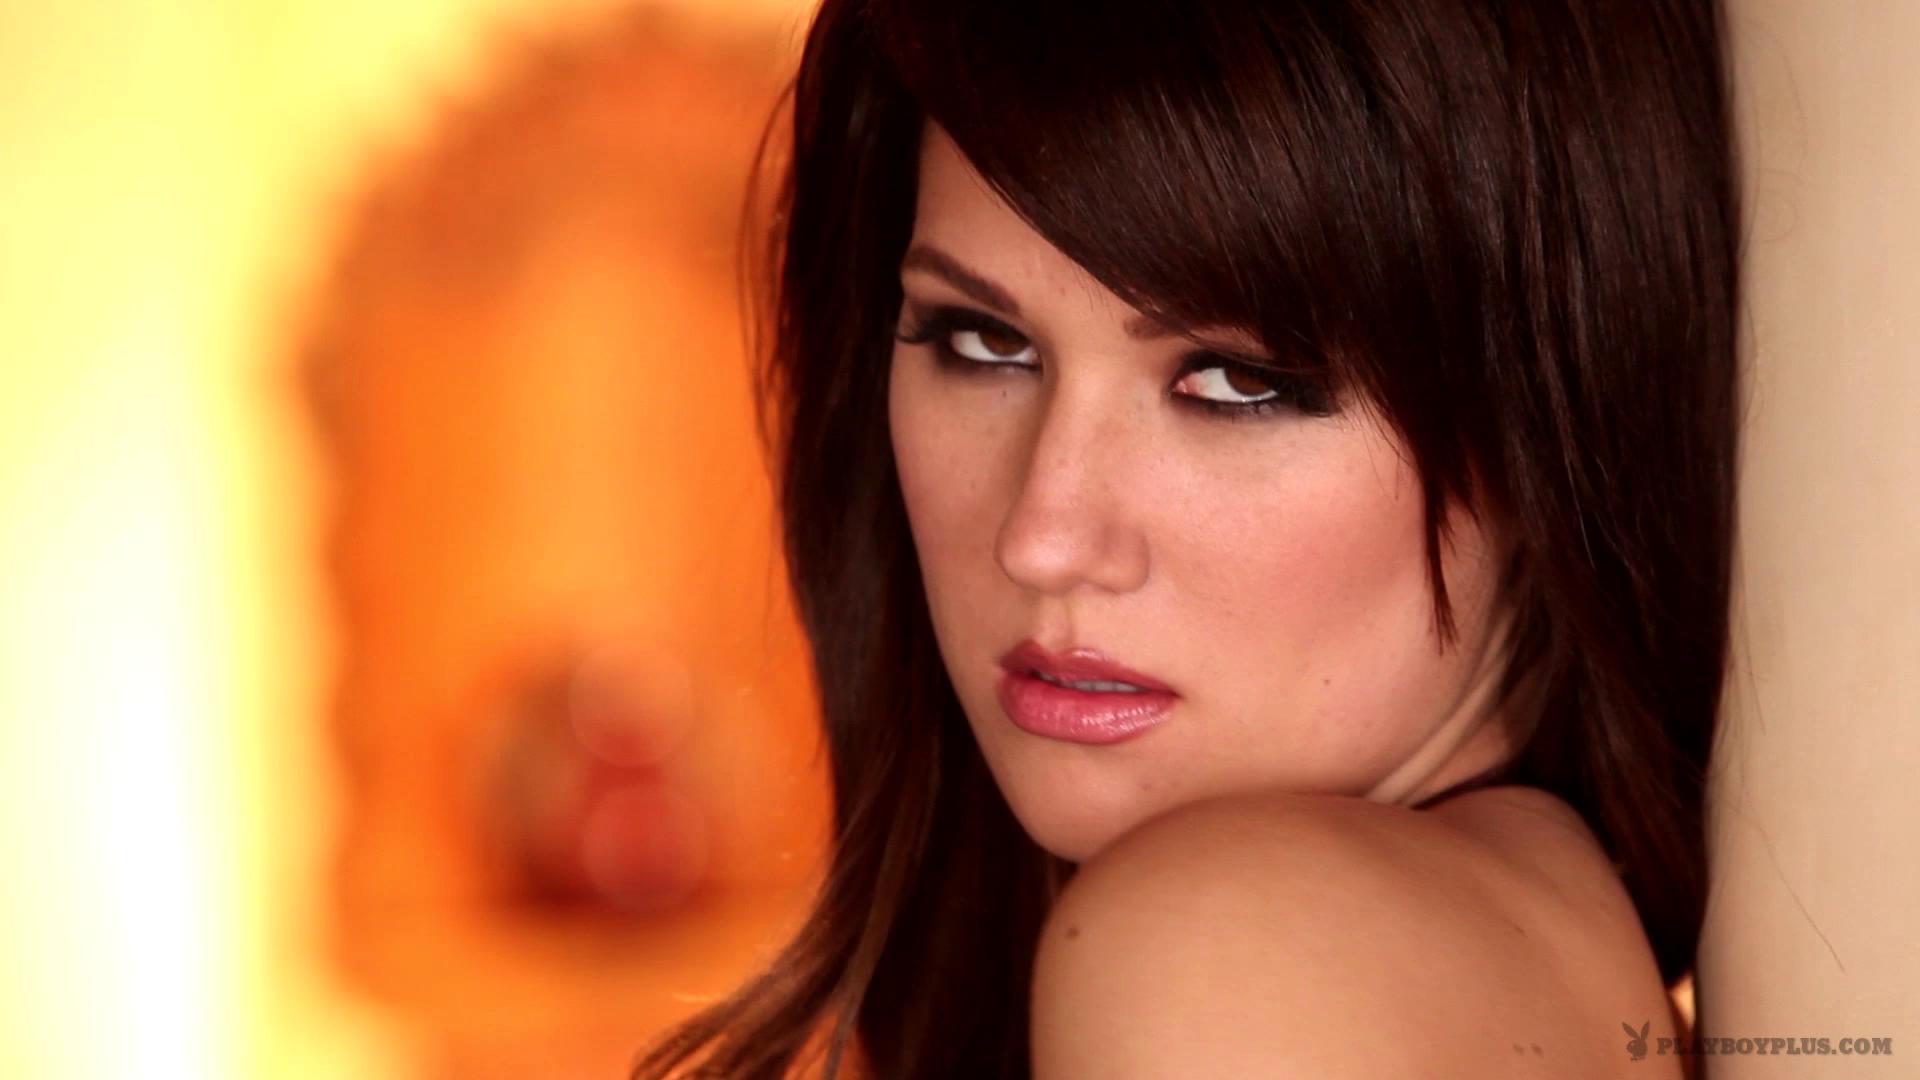 PlayboyPlus – Unpublished Kimberly Kisselovich Vol 1